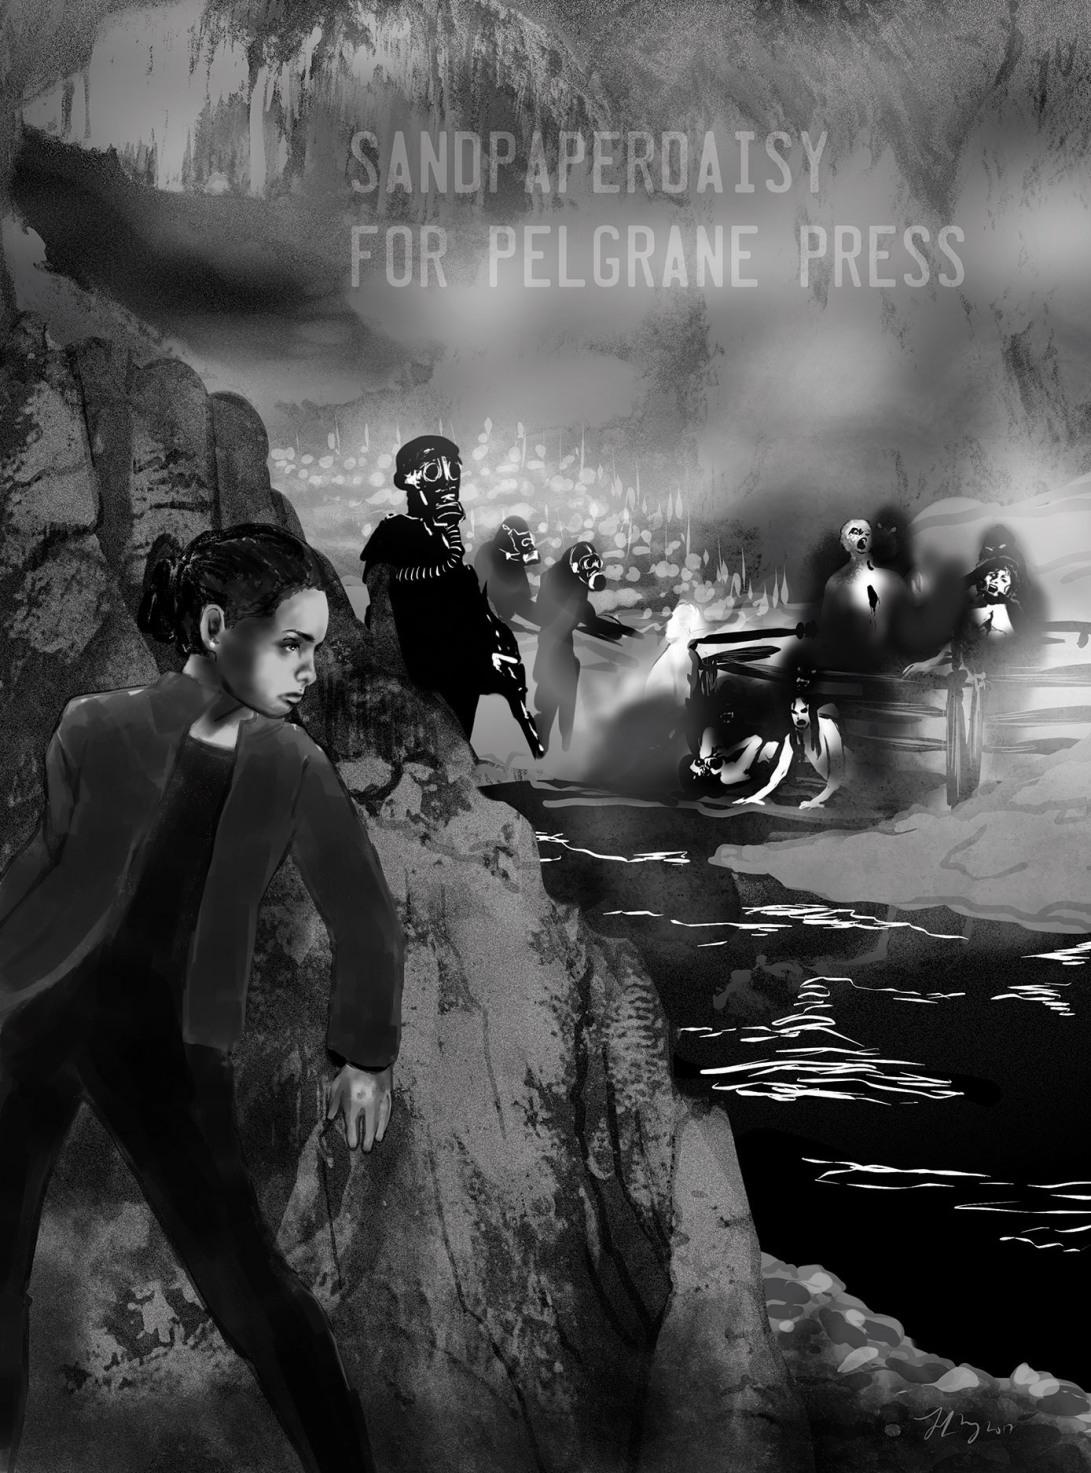 Pelgrane-NightsBlackAgents-Underground02_sandpaperdaisy